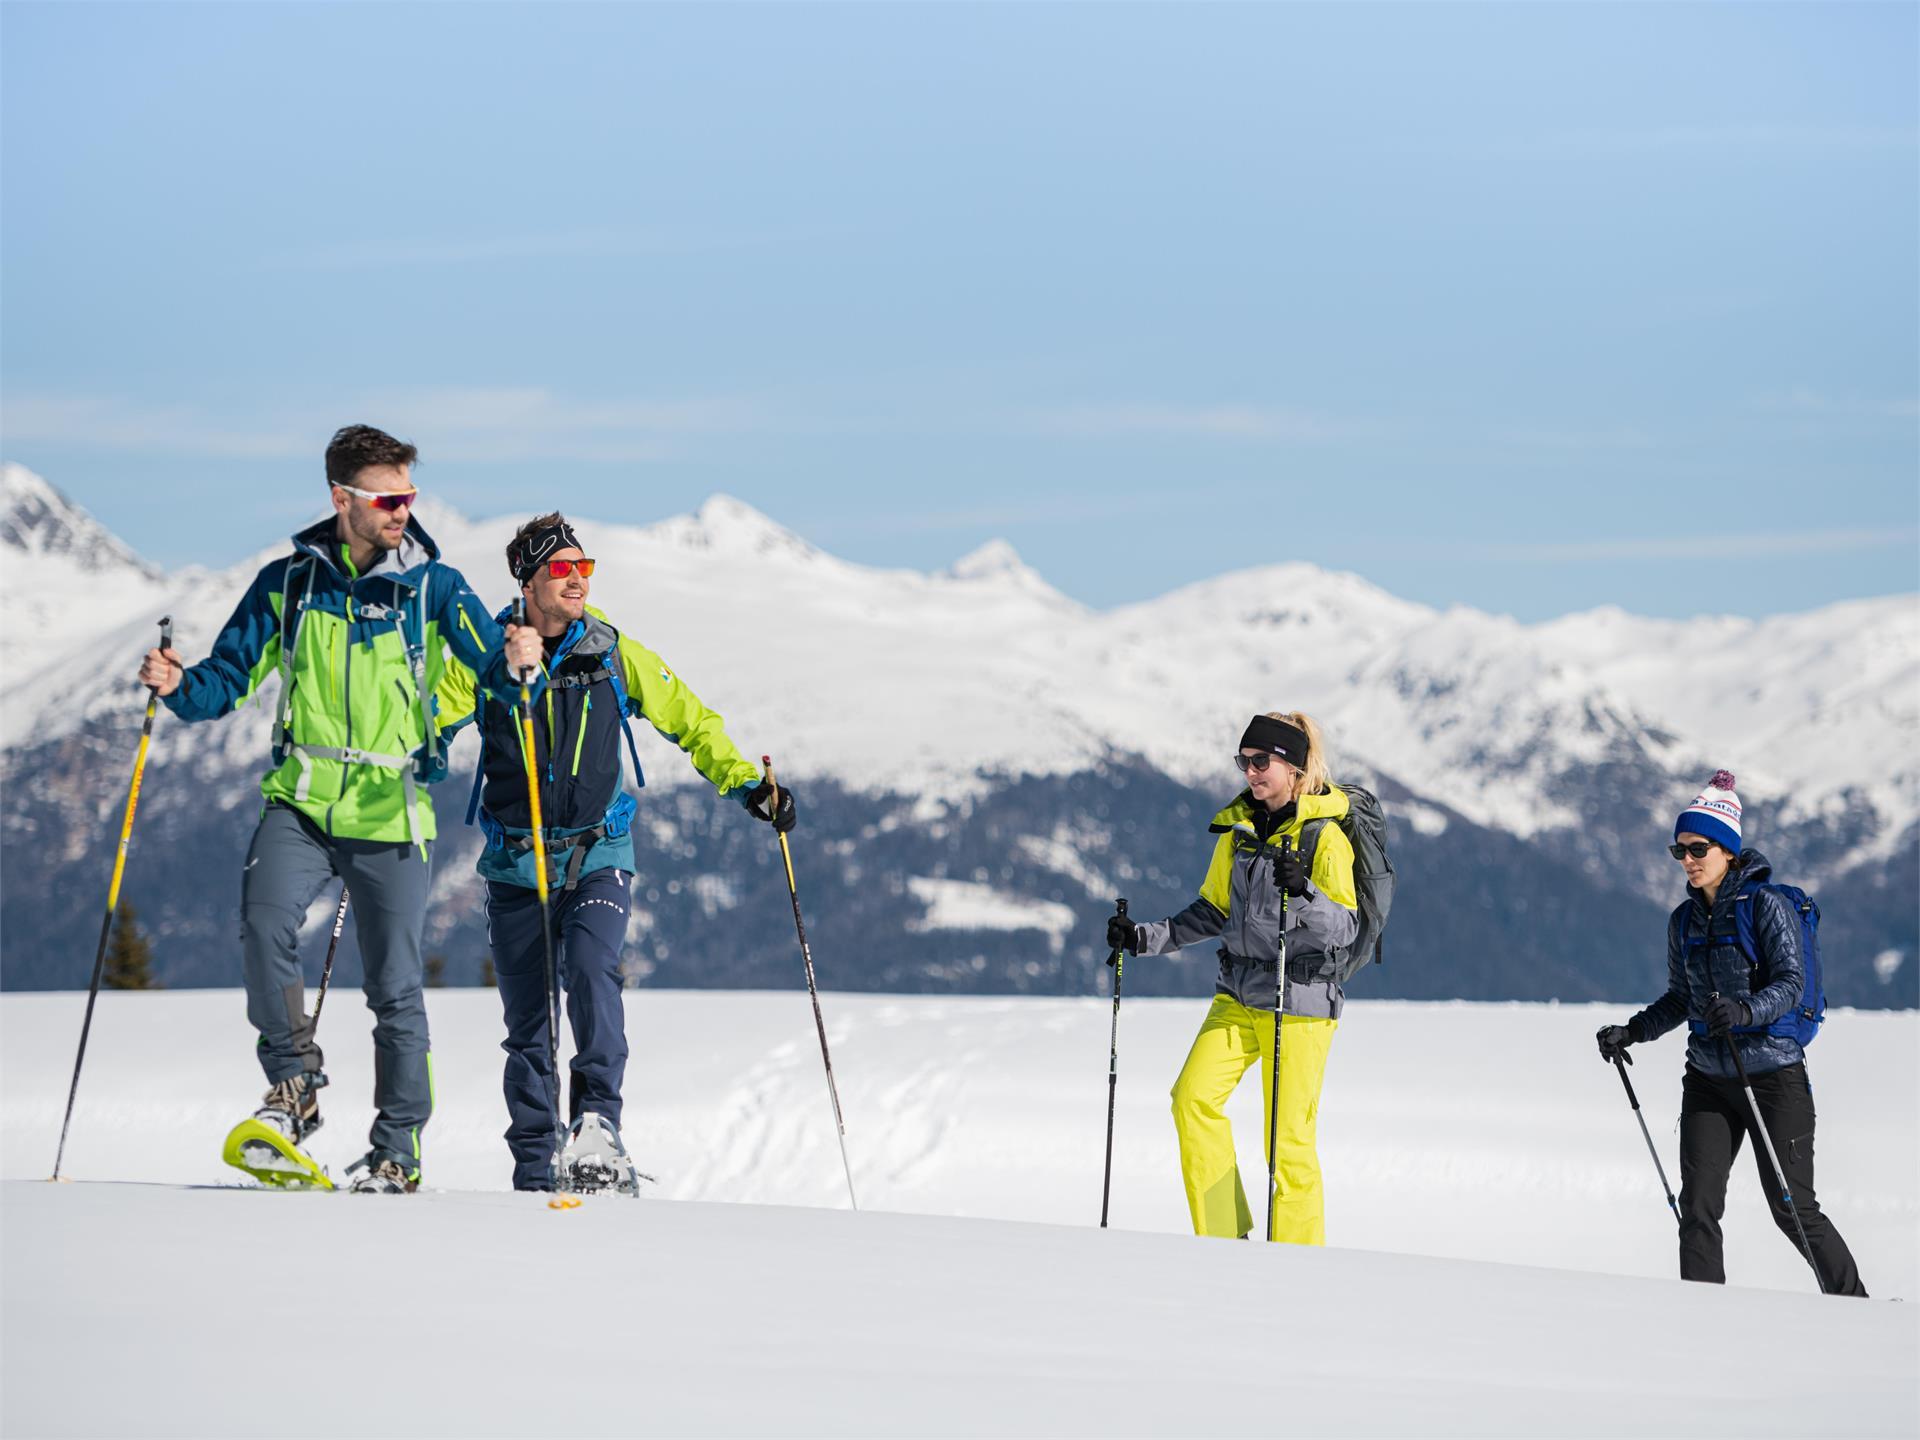 Mittelschwere Schneeschuhwanderung